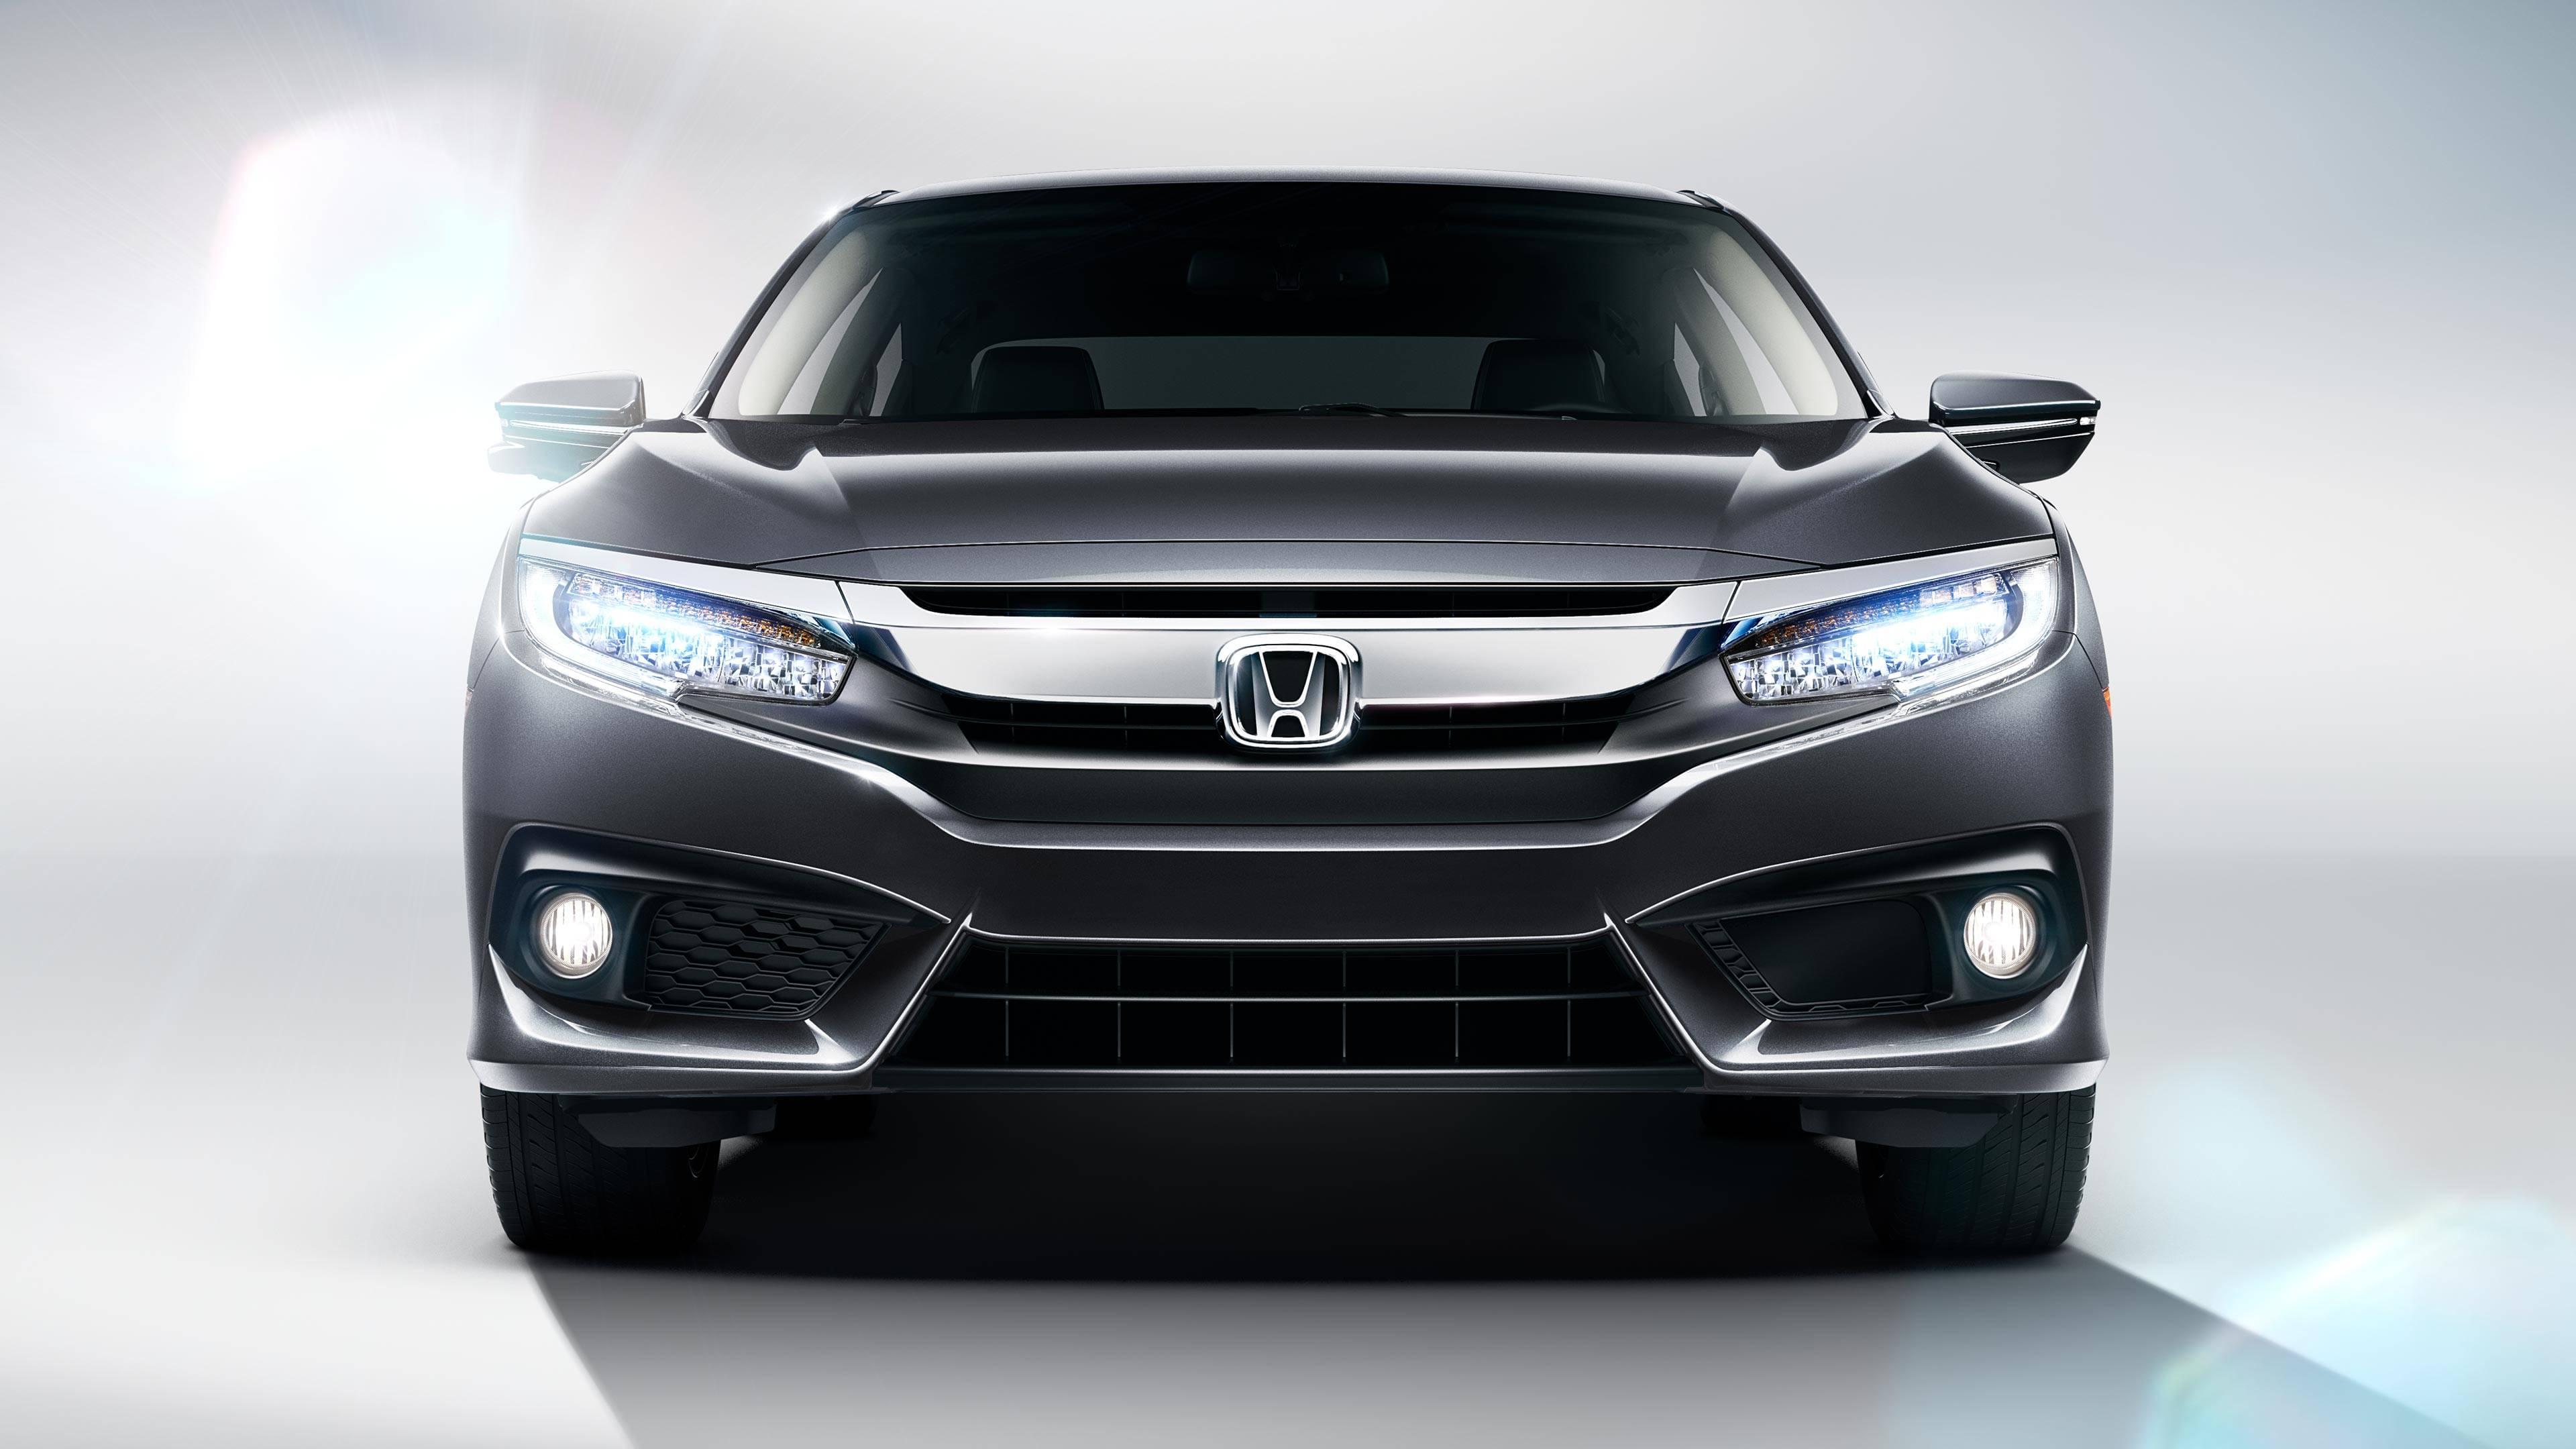 Certified Pre Owned Honda Odyssey Touring Pickering Honda Reviews the 2017 Civic Sedan Touring ...